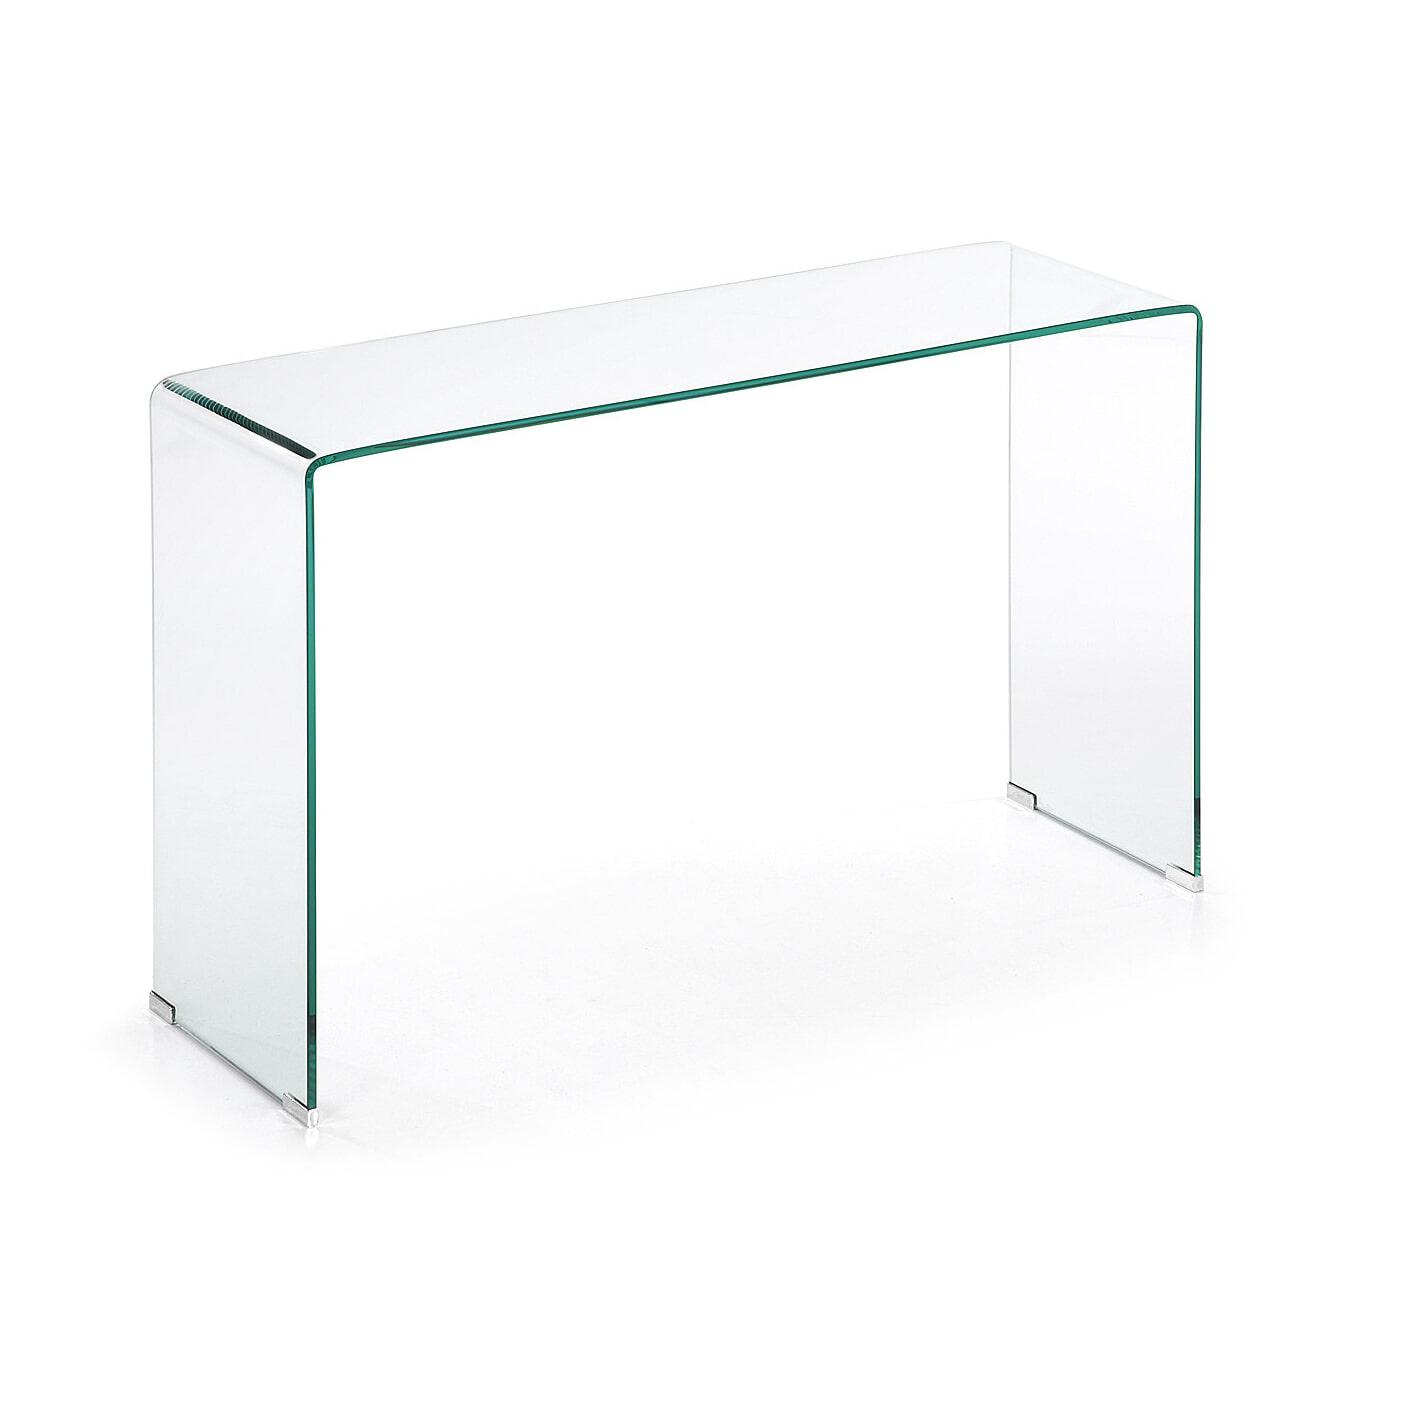 Glazen Wandtafel Sidetable.Kave Home Glazen Sidetable Burano 125 X 40 Cm